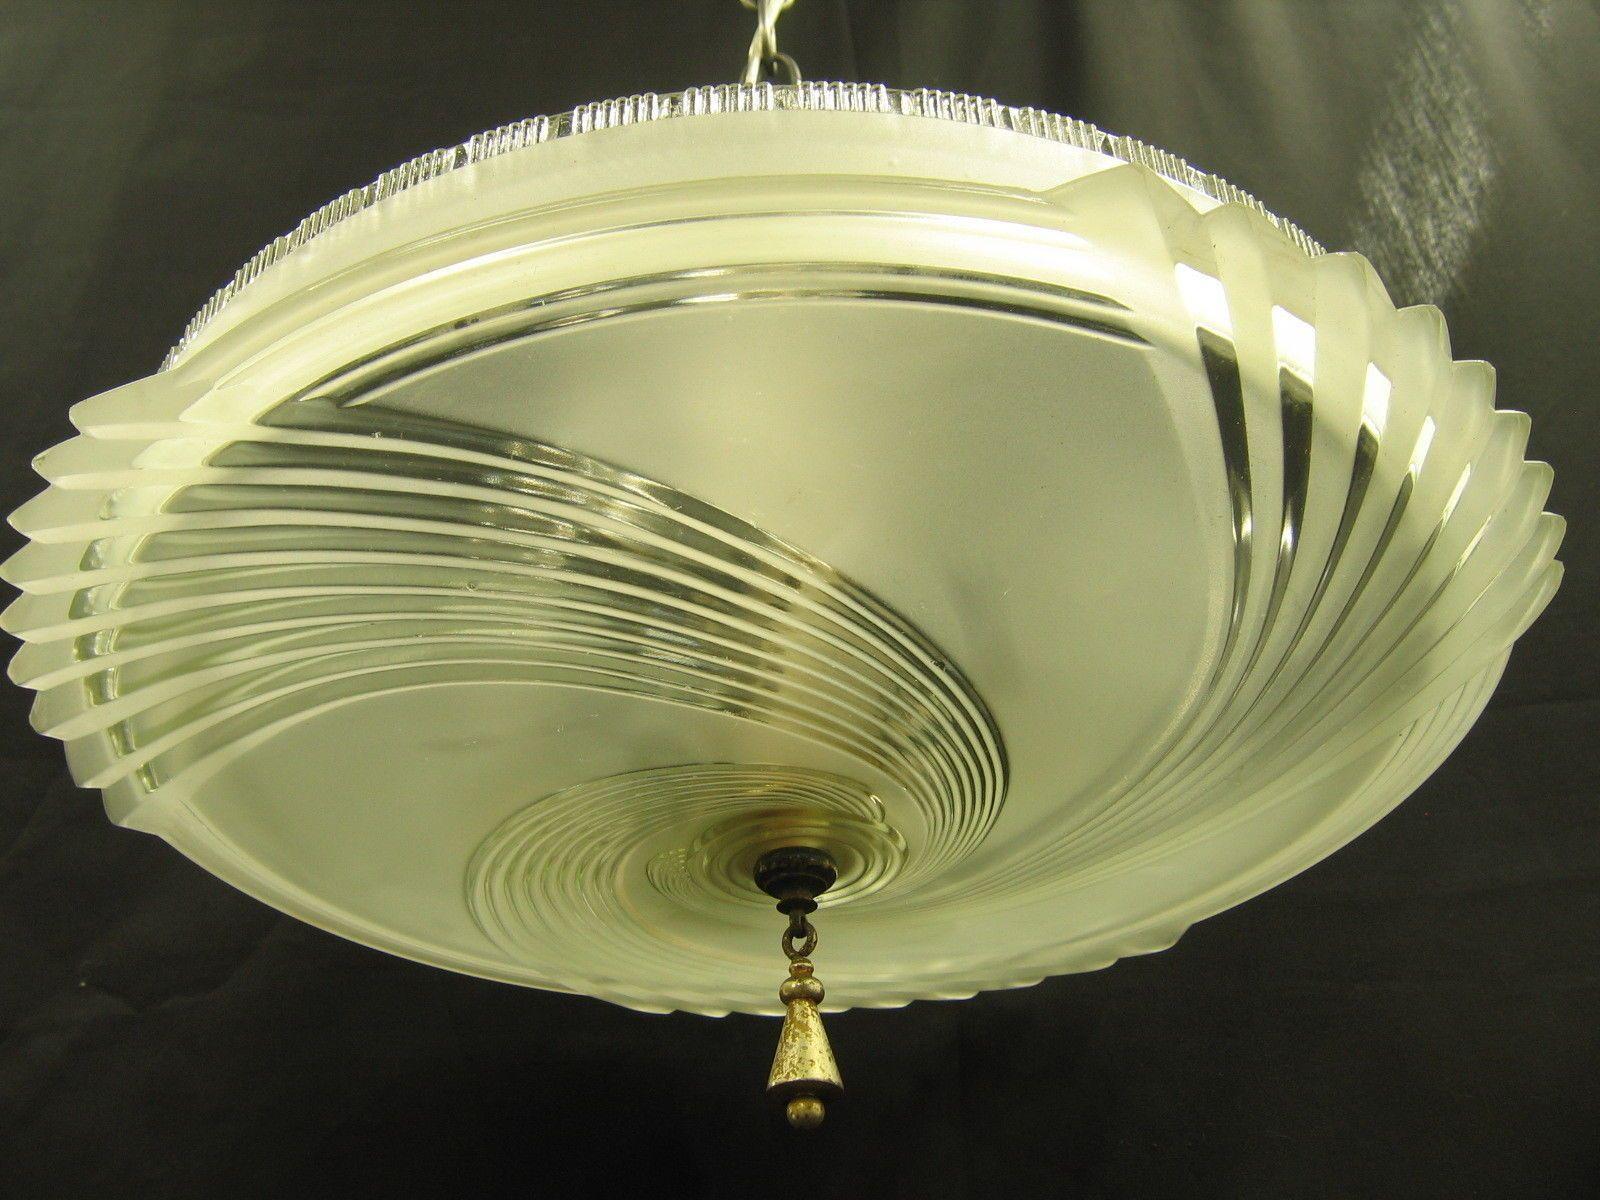 0955 art deco ceiling light fixture dome crystal mount rewired 1940 0955 art deco ceiling light fixture dome crystal mount rewired 1940 chandelier arubaitofo Gallery